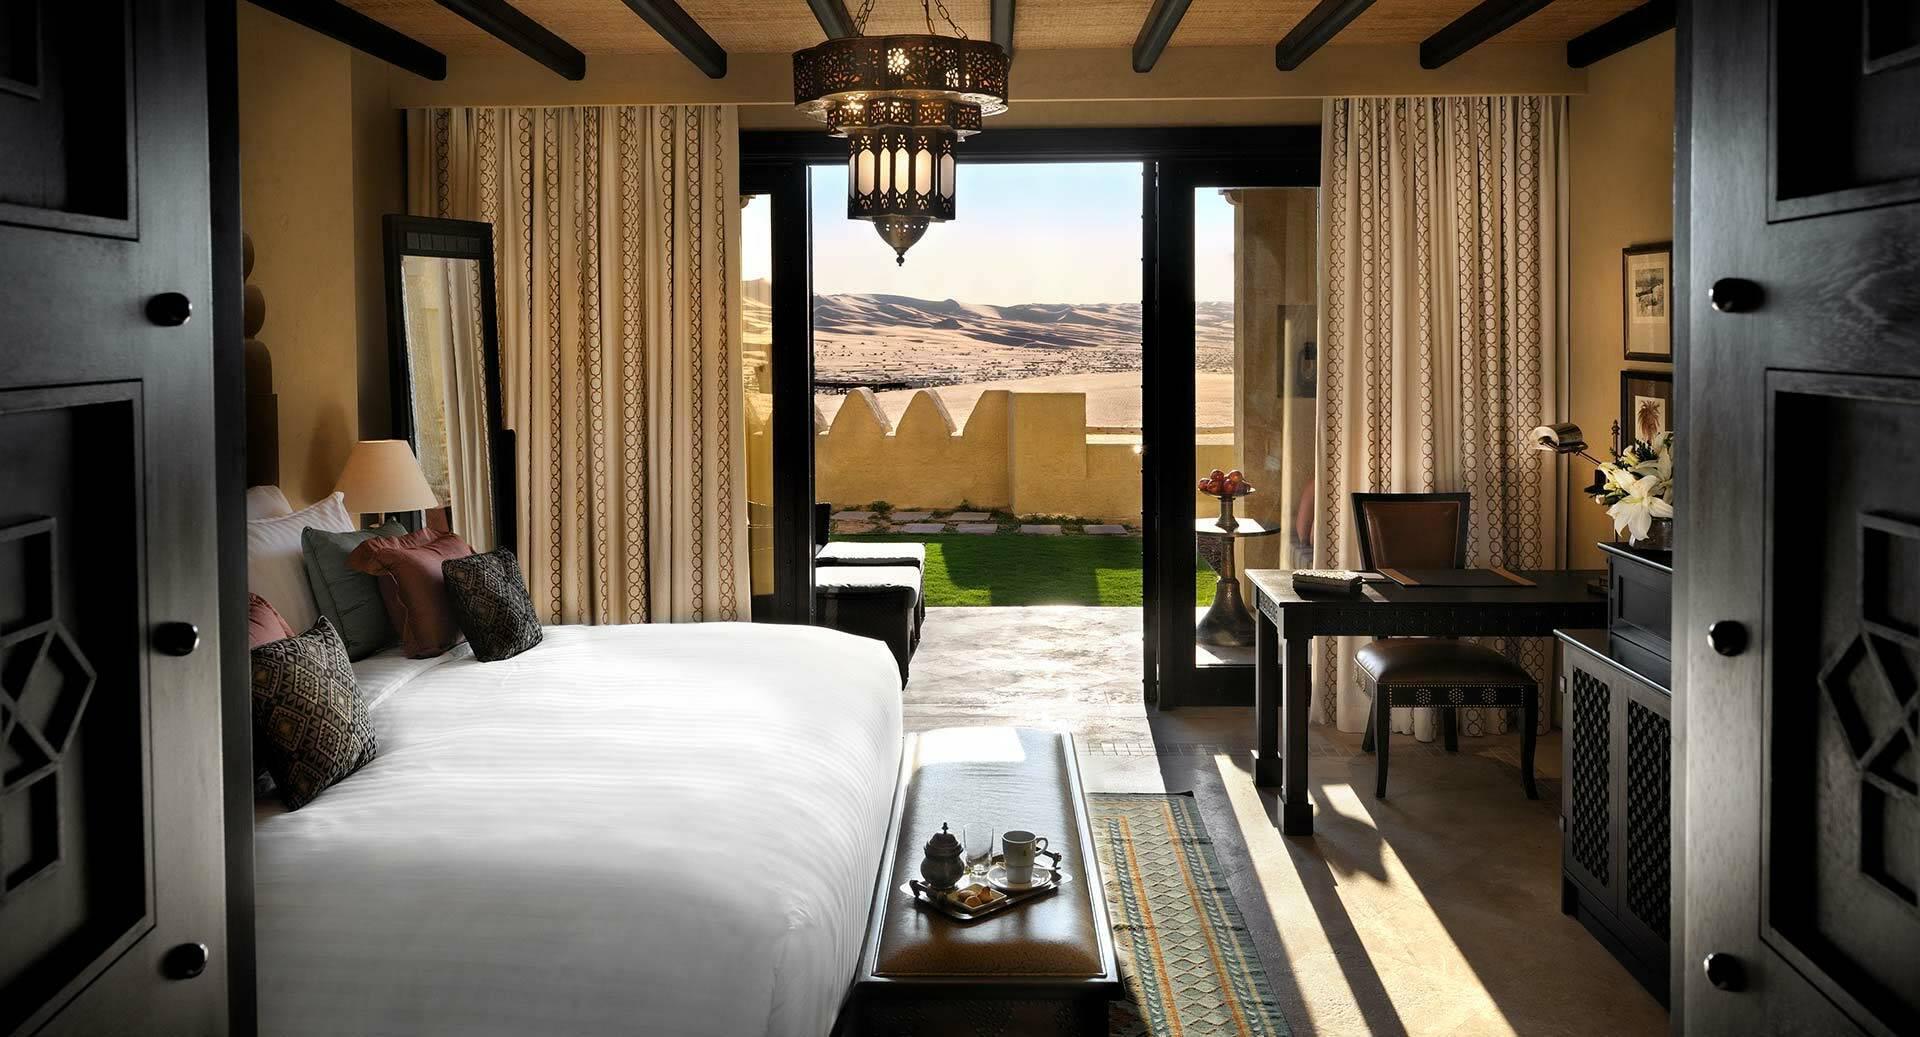 Abu Dhabi Anantara Qasr al Sarab Desert deluxe garden view room